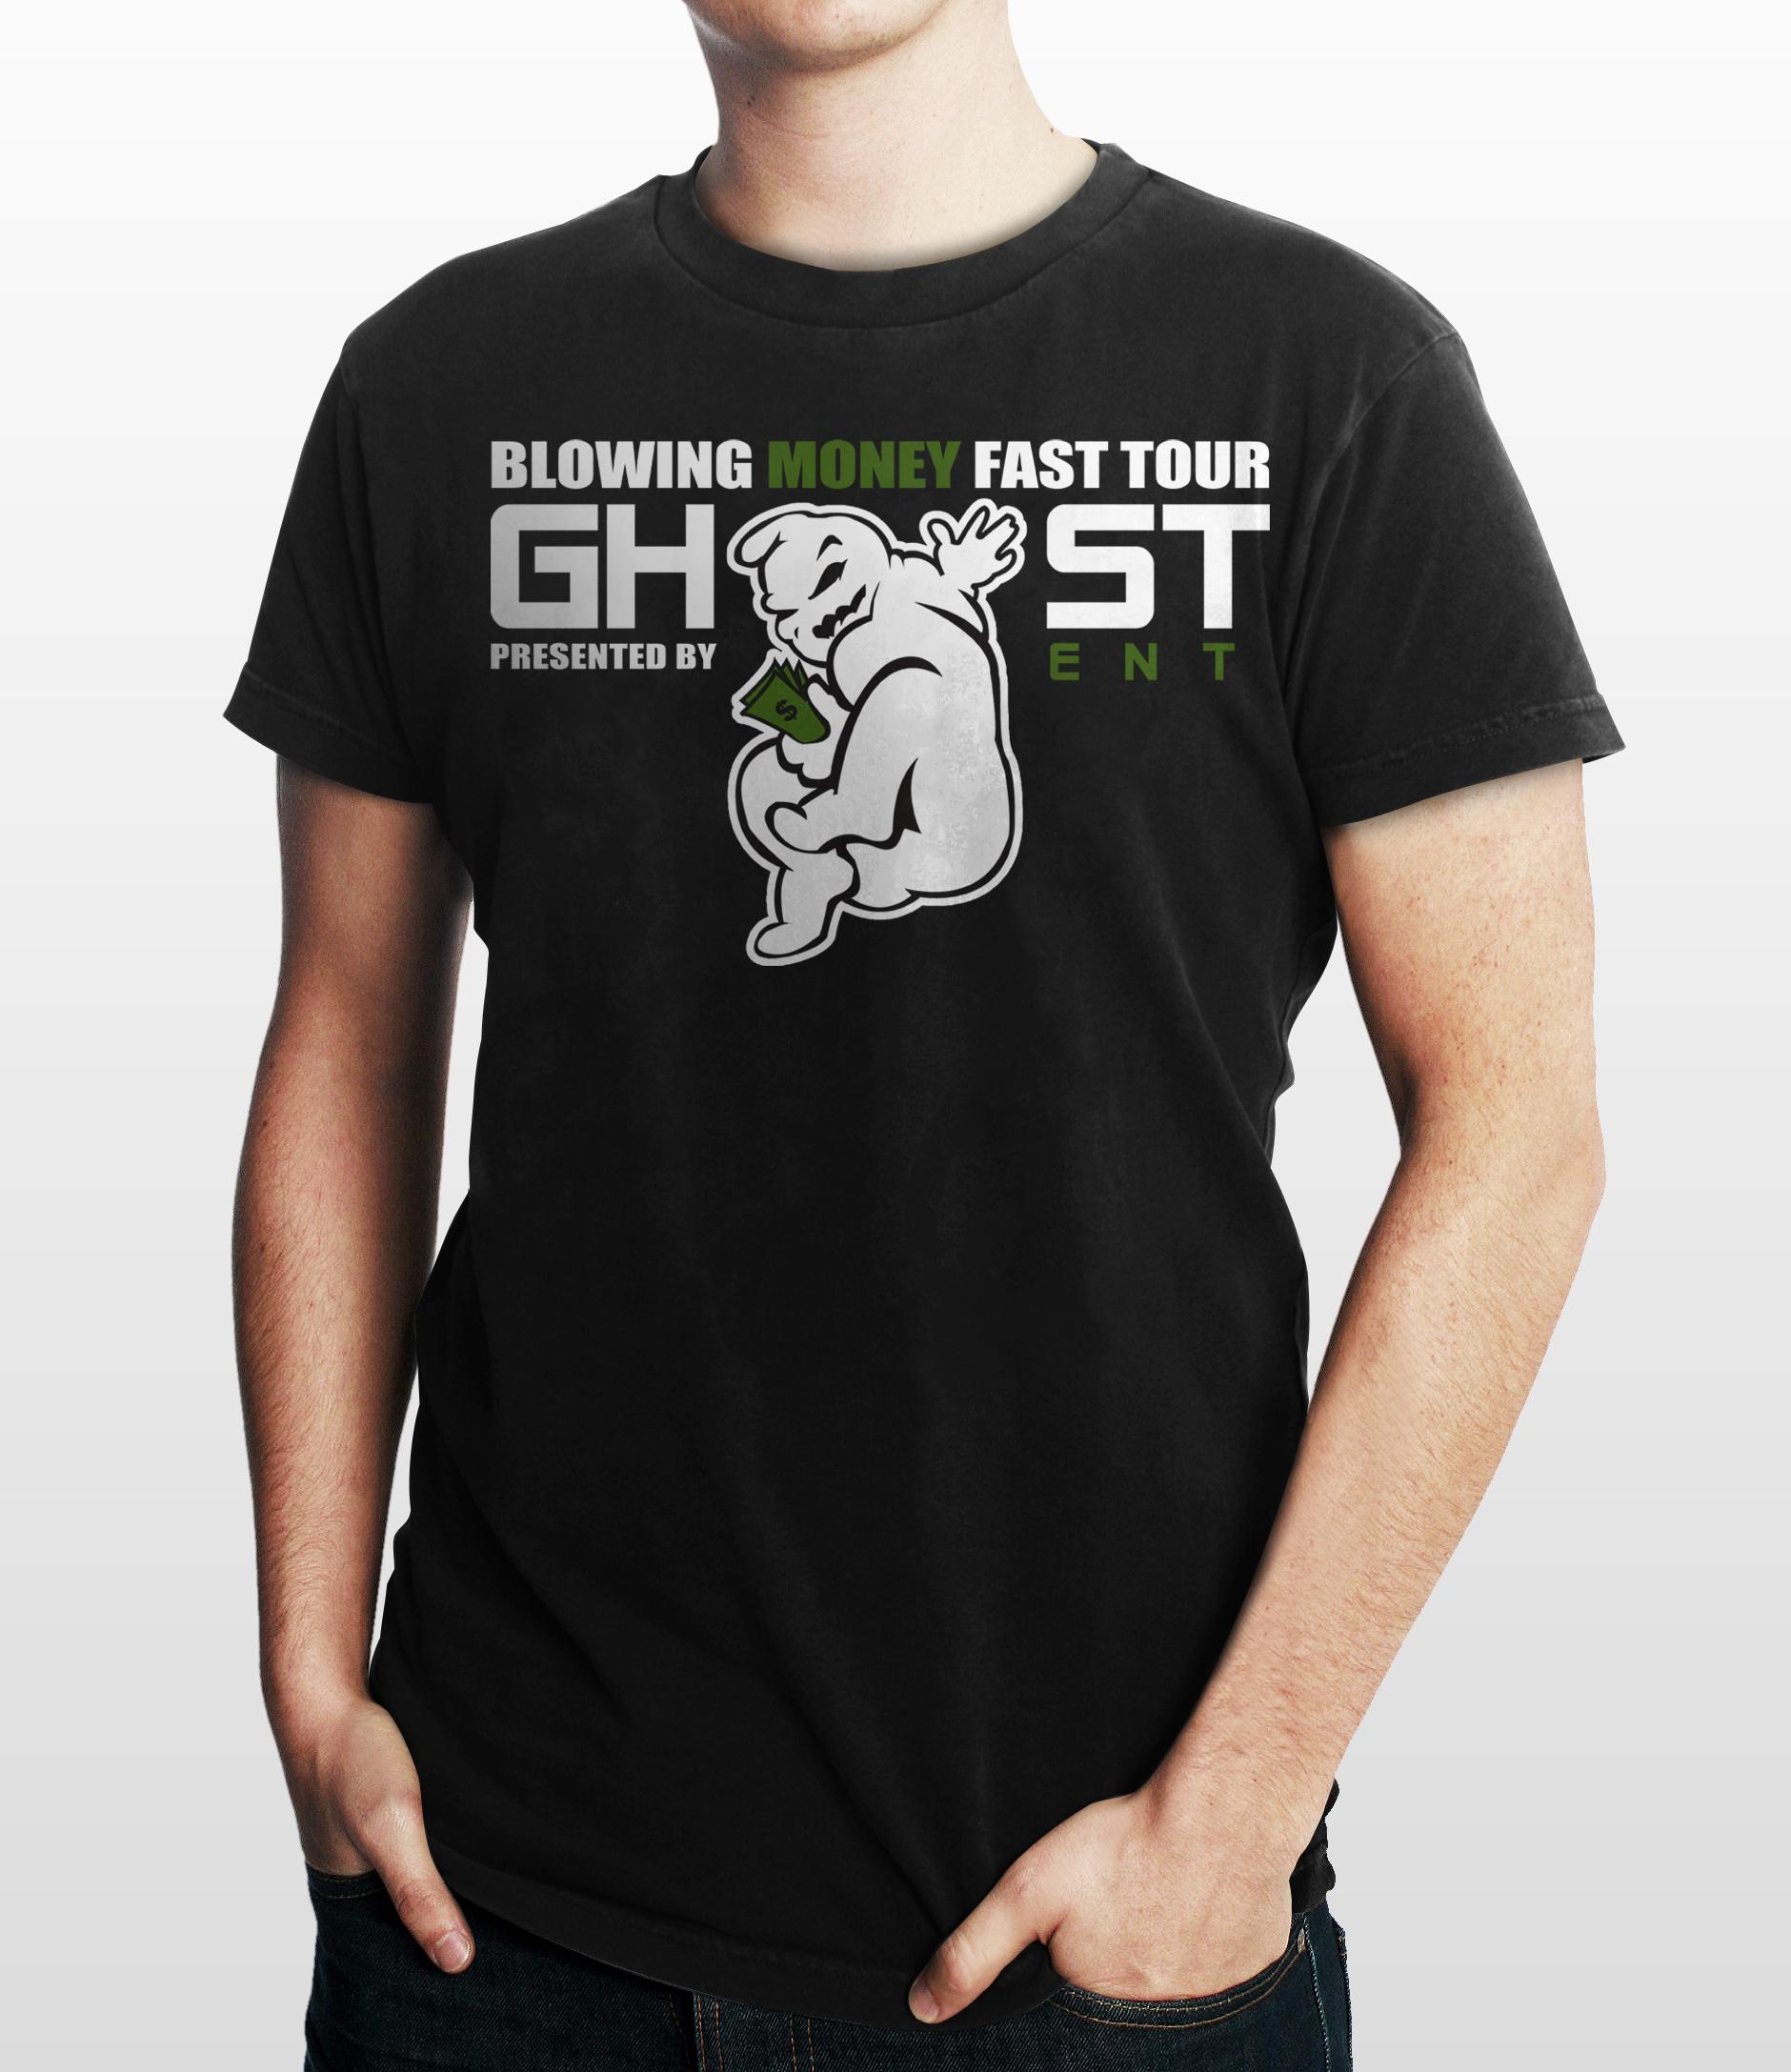 GHOST ENT - T-shirt Design